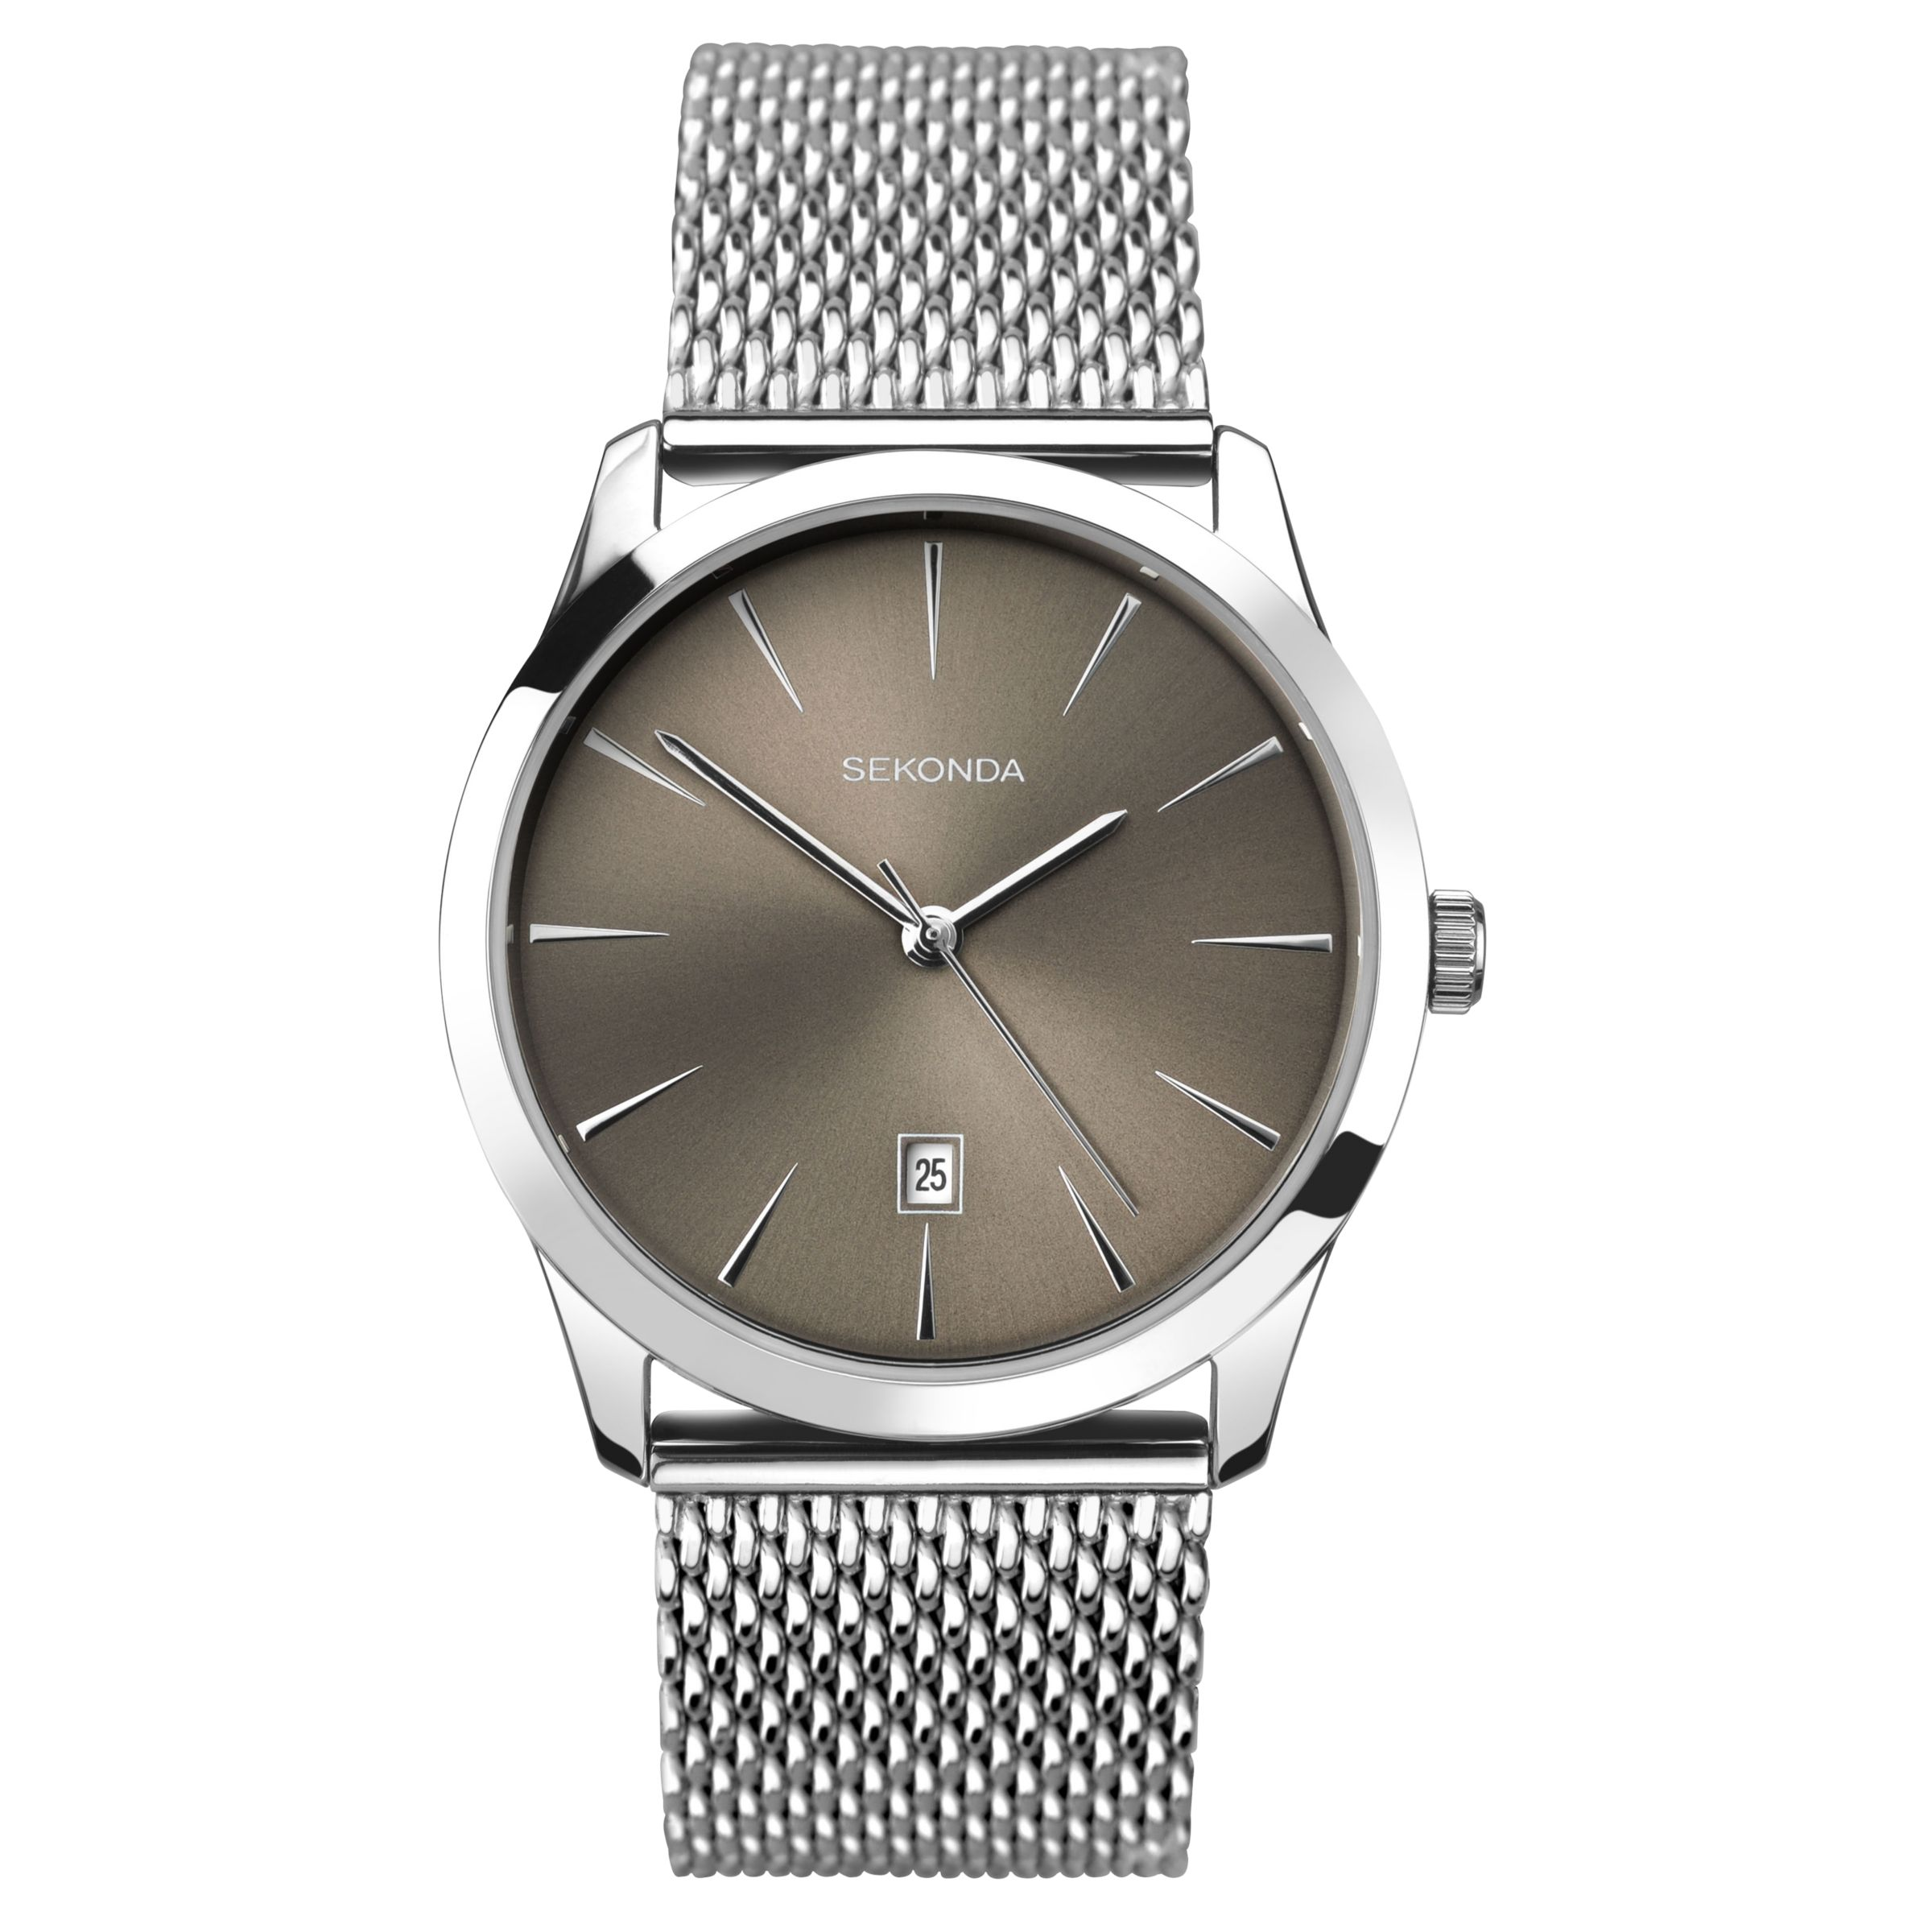 Sekonda Sekonda 1587.27 Men's Date Mesh Bracelet Strap Watch, Silver/Grey